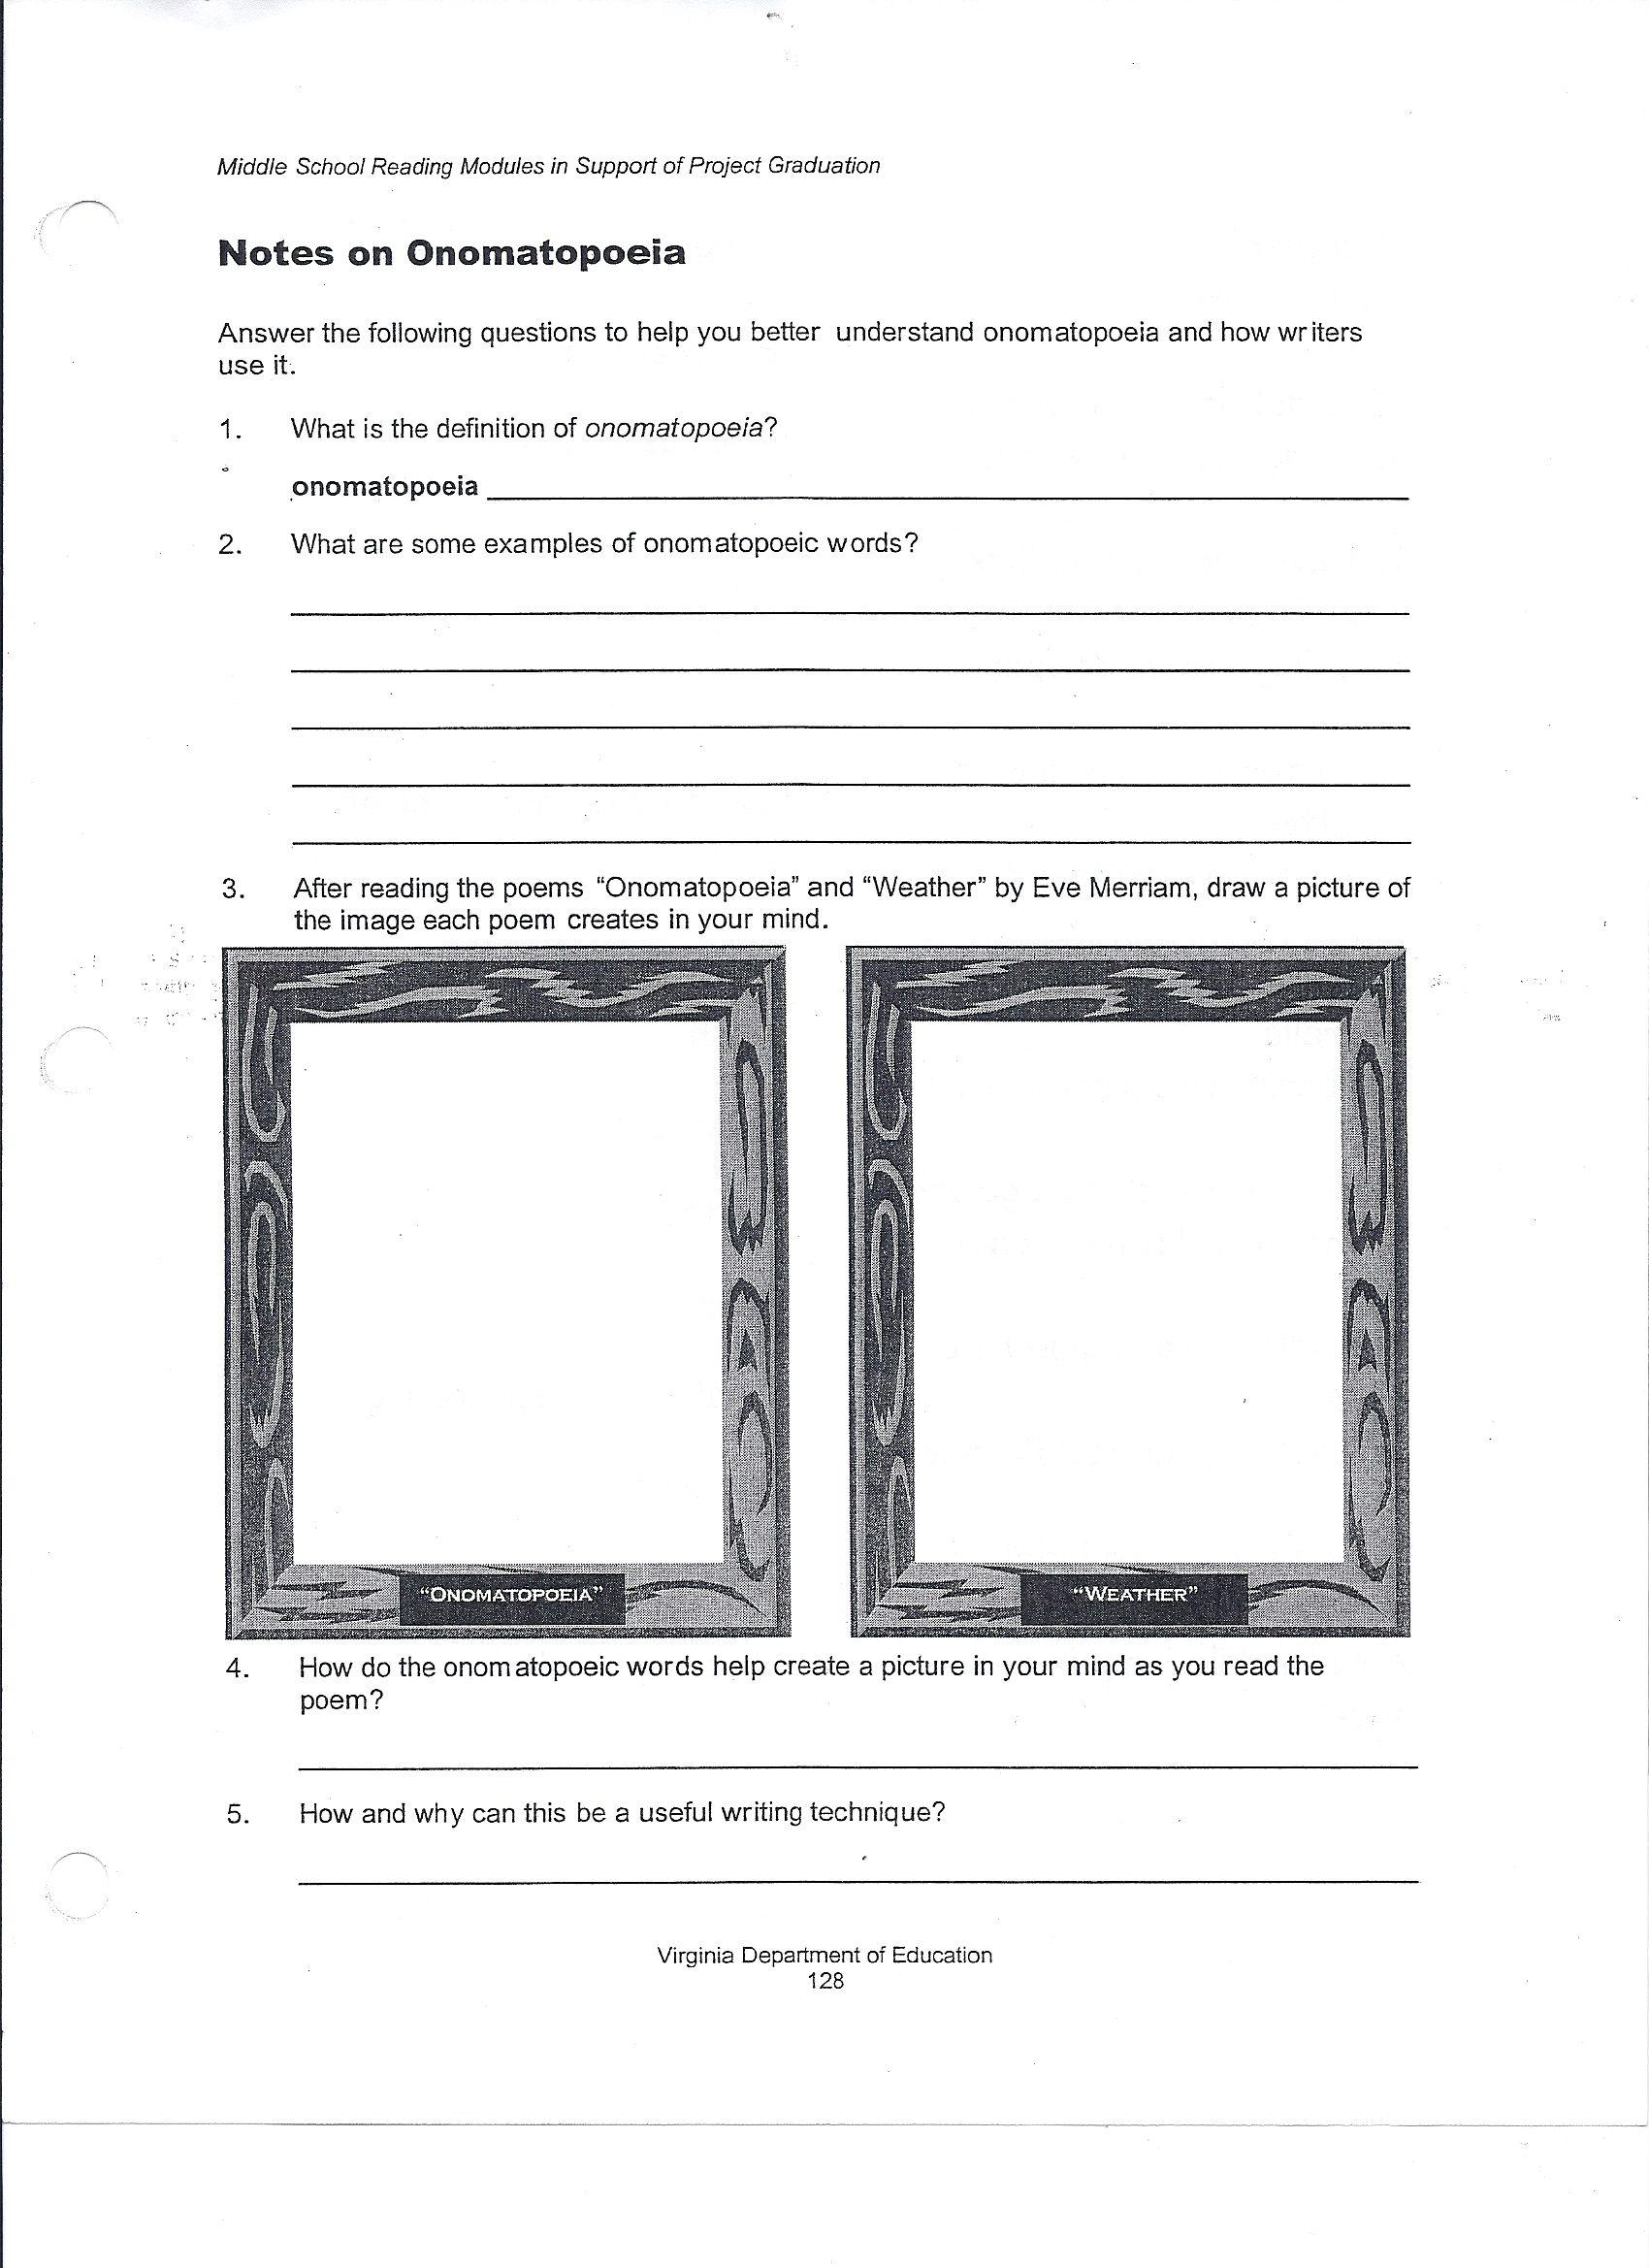 worksheet Middle School Language Arts Worksheets elements of art worksheets 6th grade lessons middle school language arts help